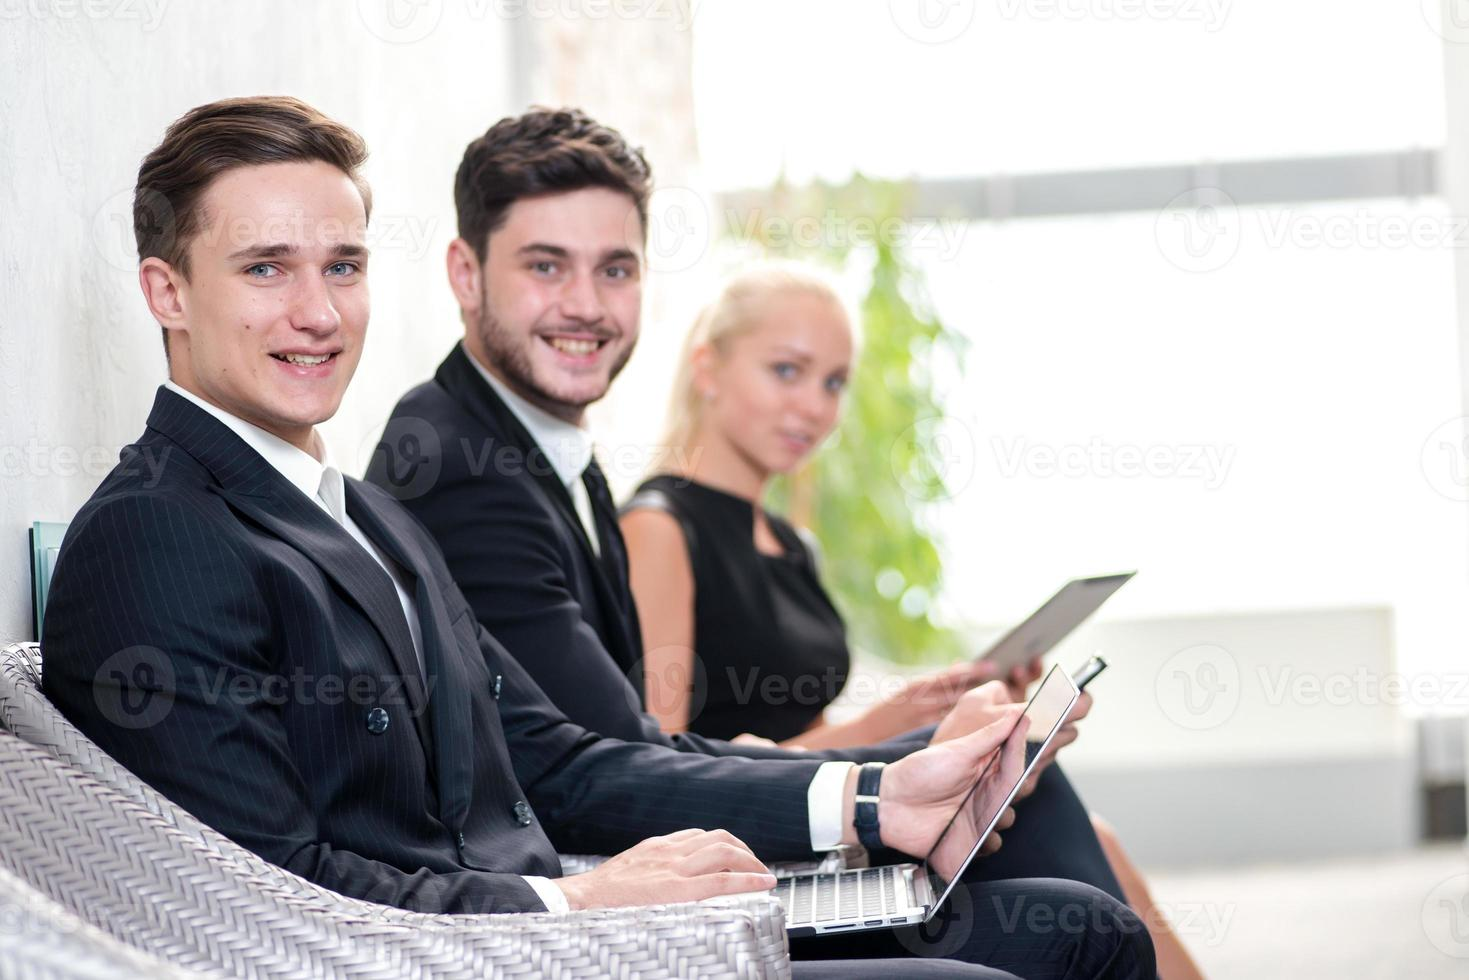 Bewerber. Drei Personen in Abendgarderobe warten im Büro foto